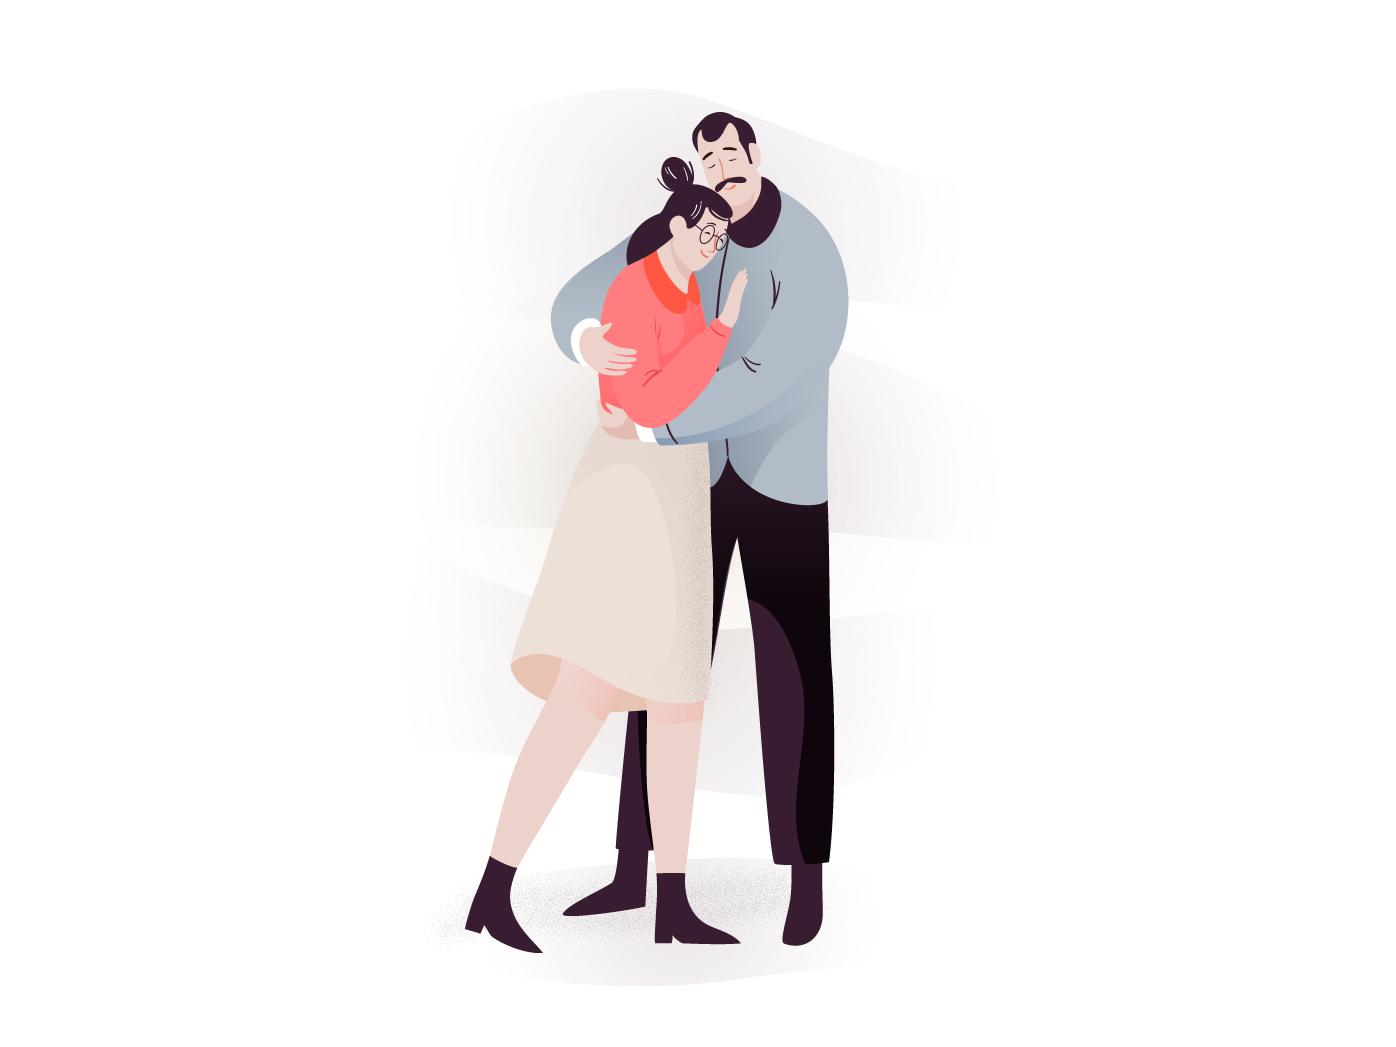 Keep warm warm hug couple app design mobile man pastel people vector woman character illustration